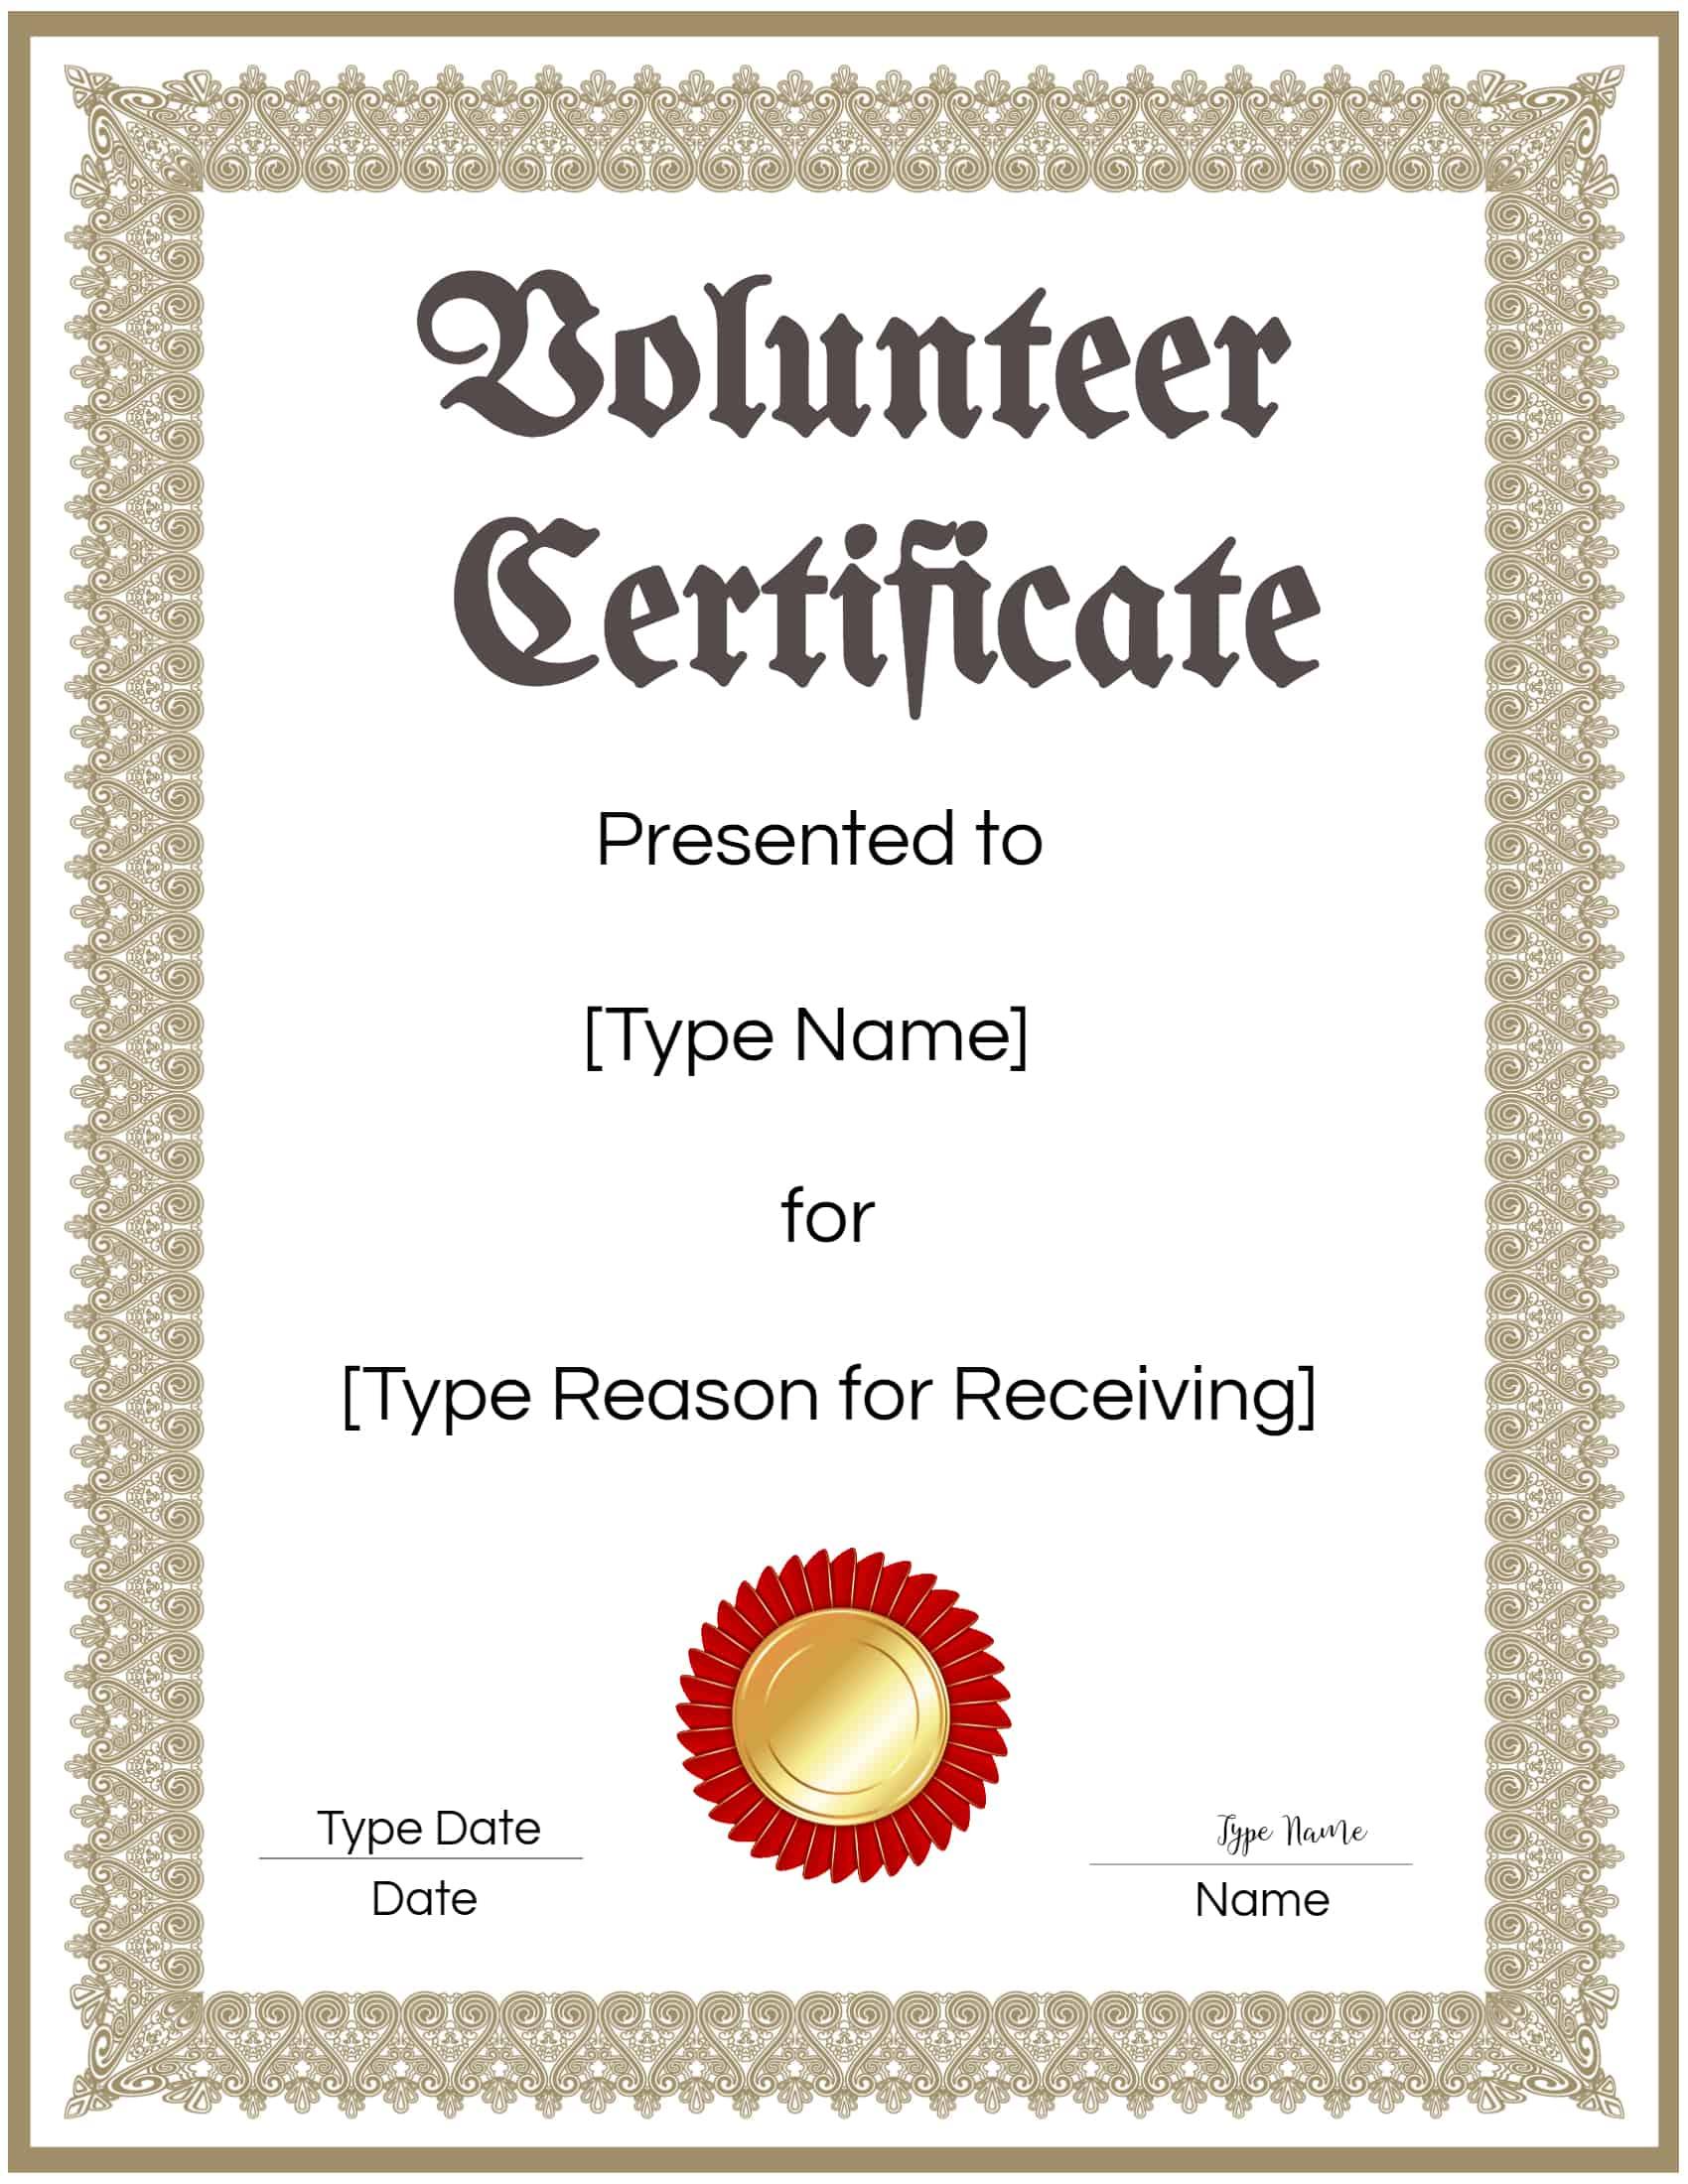 FREE Volunteer Certificate Template  Many Designs are Available With Volunteer Certificate Templates